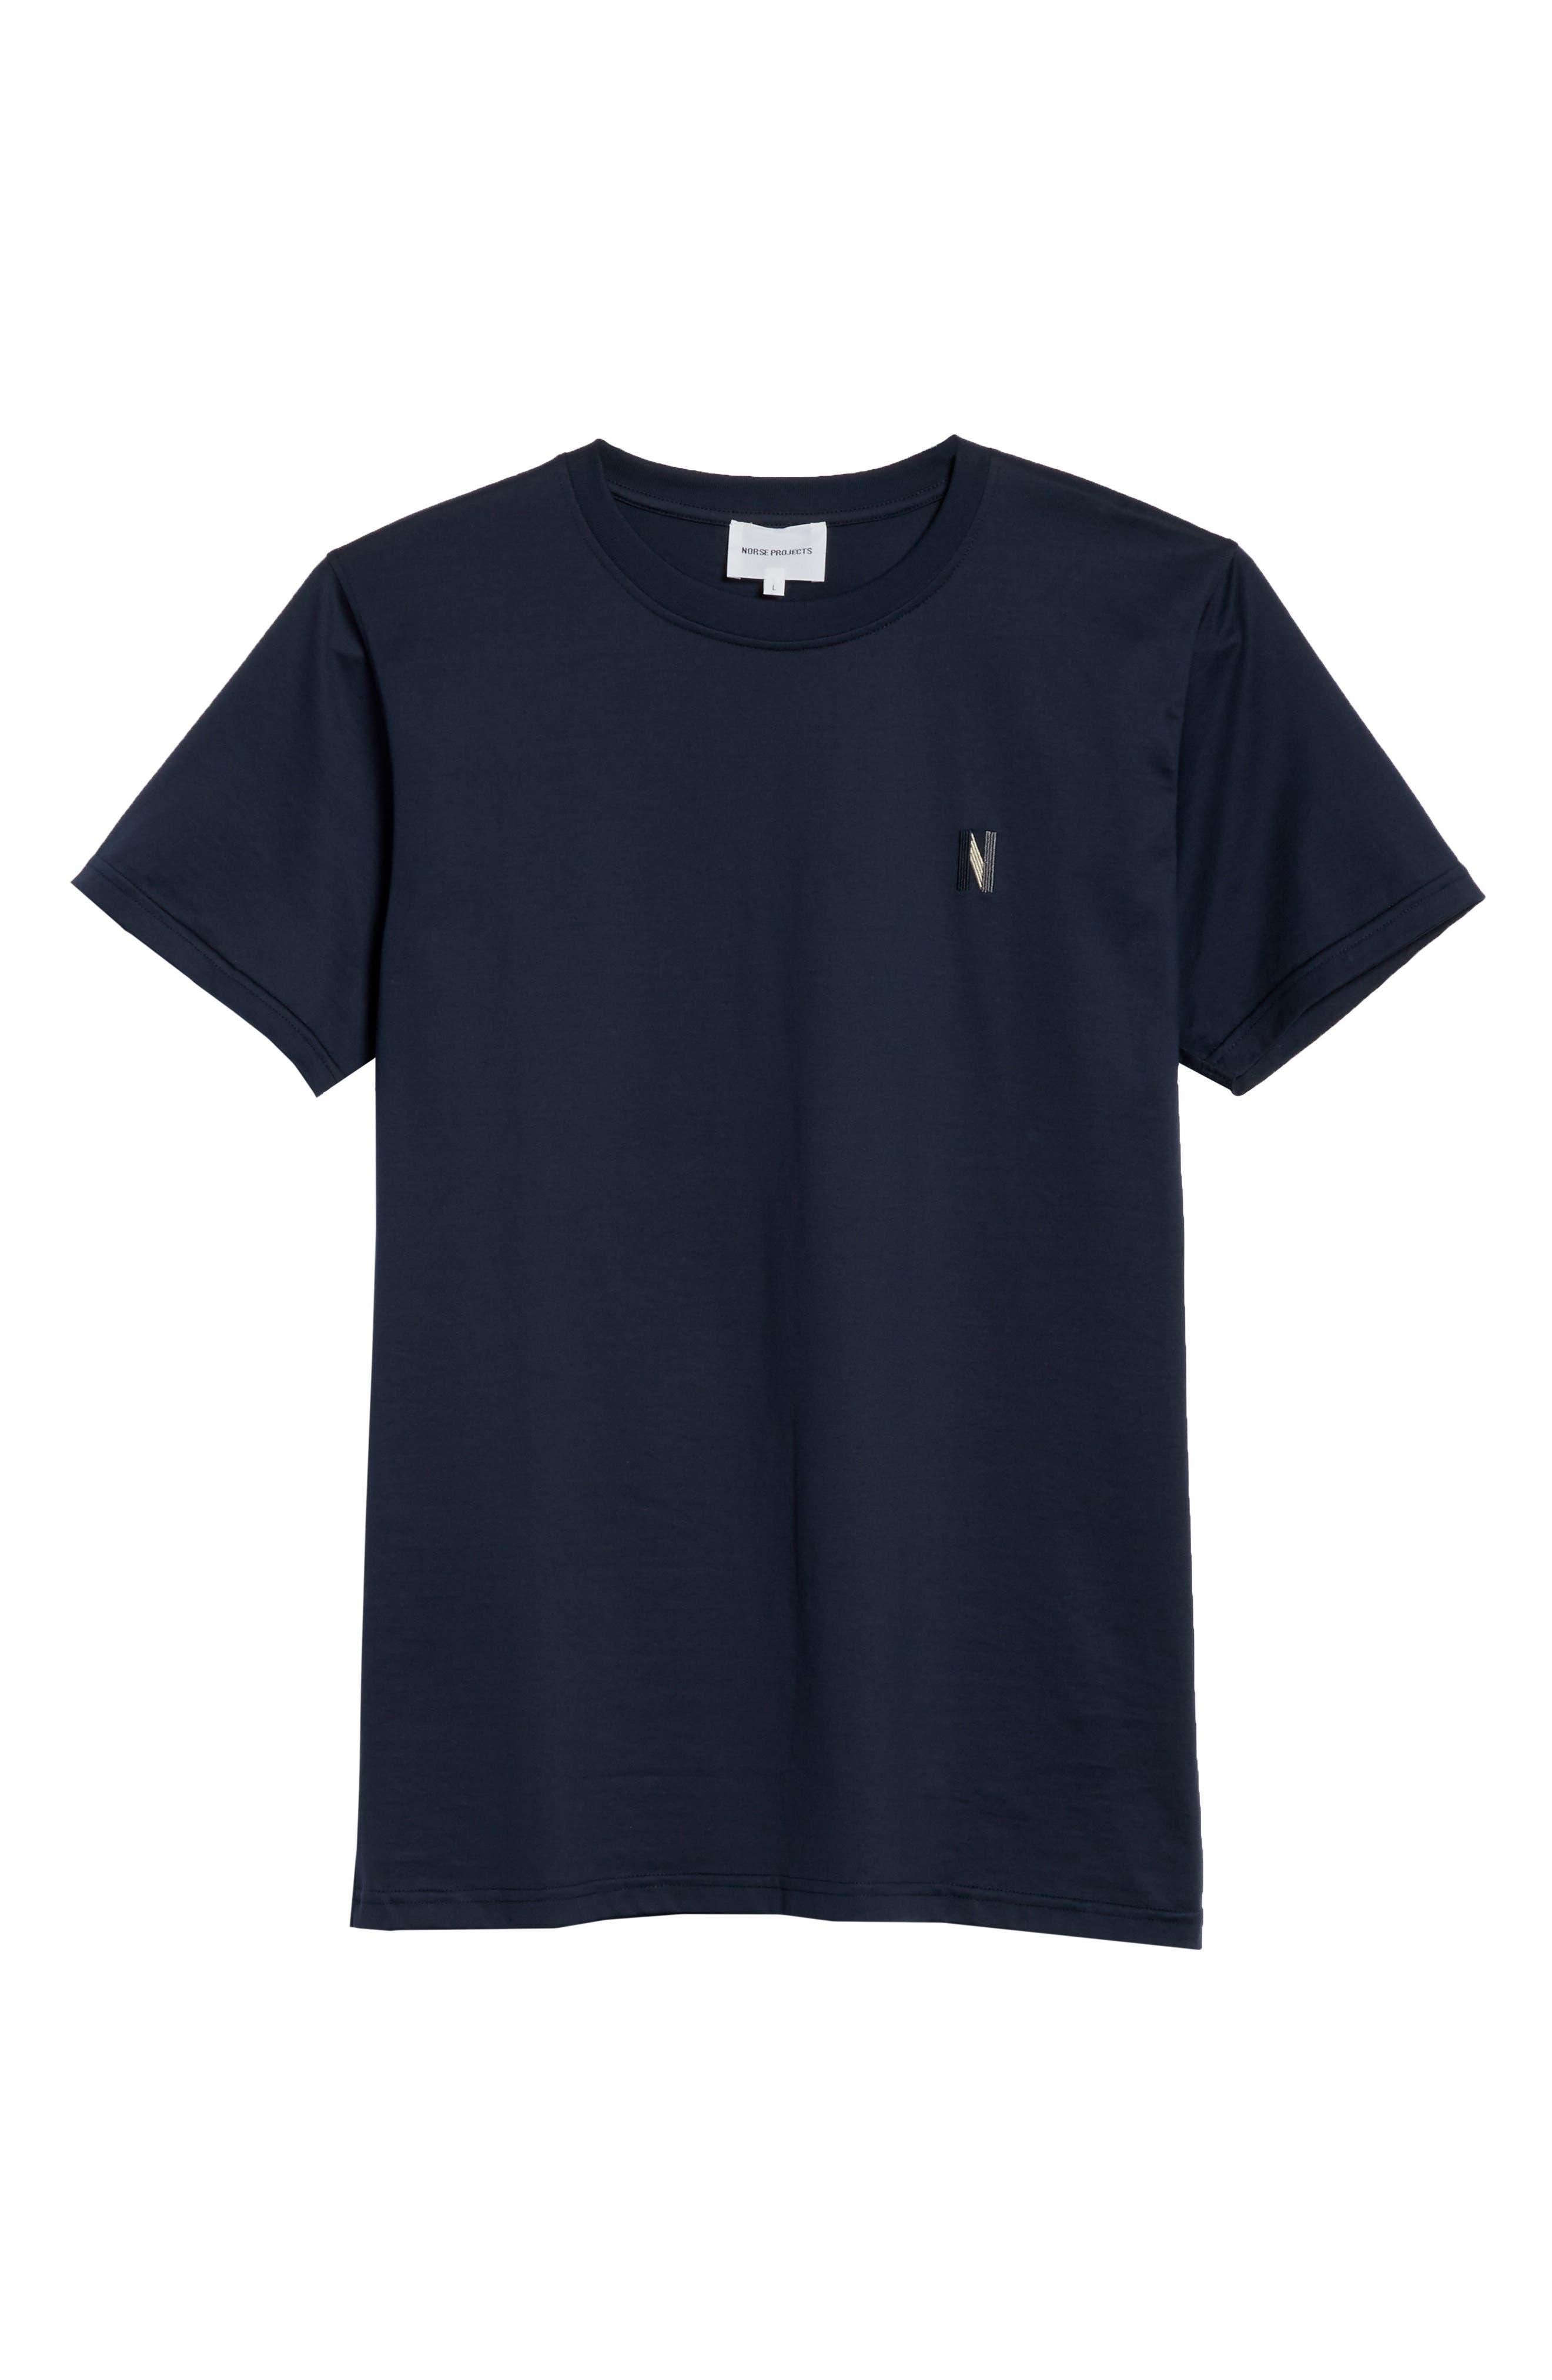 Niels N-Logo T-Shirt,                             Alternate thumbnail 6, color,                             Dark Navy